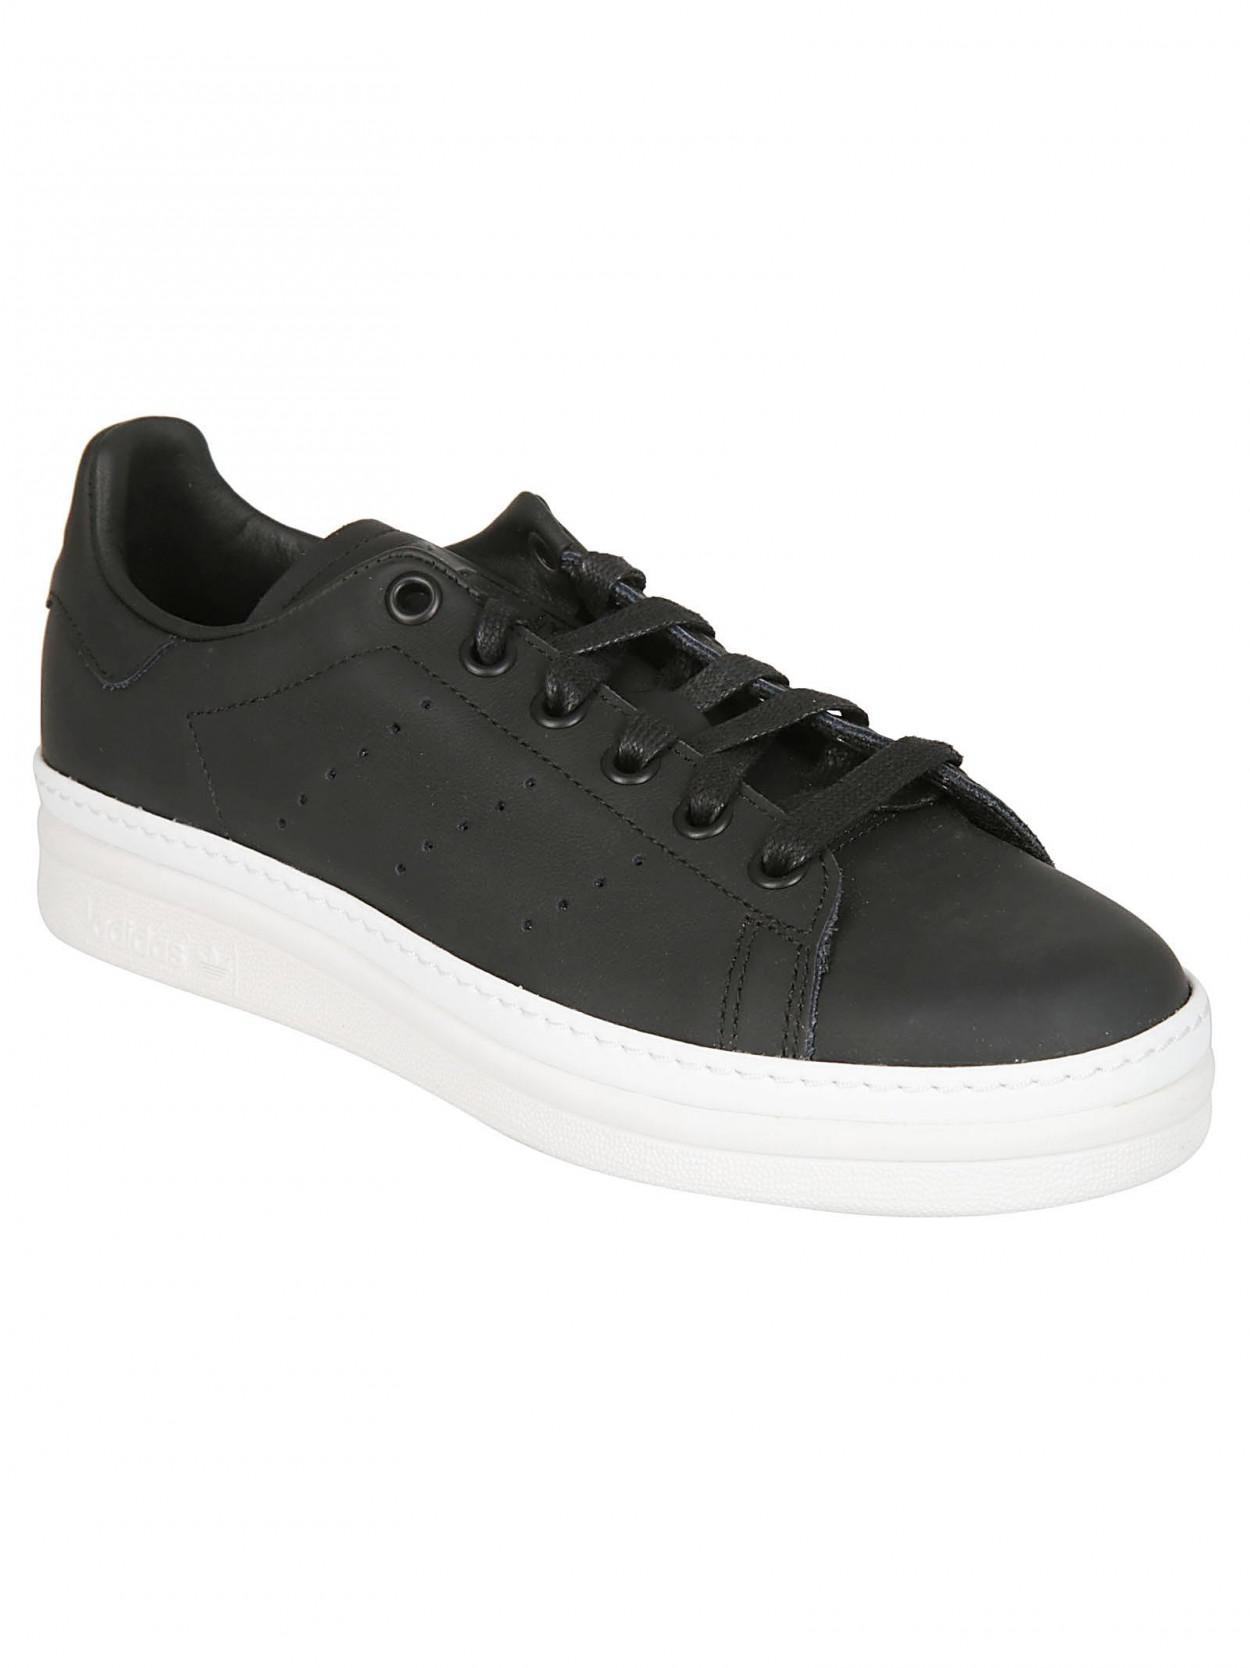 20f884c3e1a Lyst - adidas Originals ADIDAS ORIGINALS Sneaker stan smith new bold nera  in Black